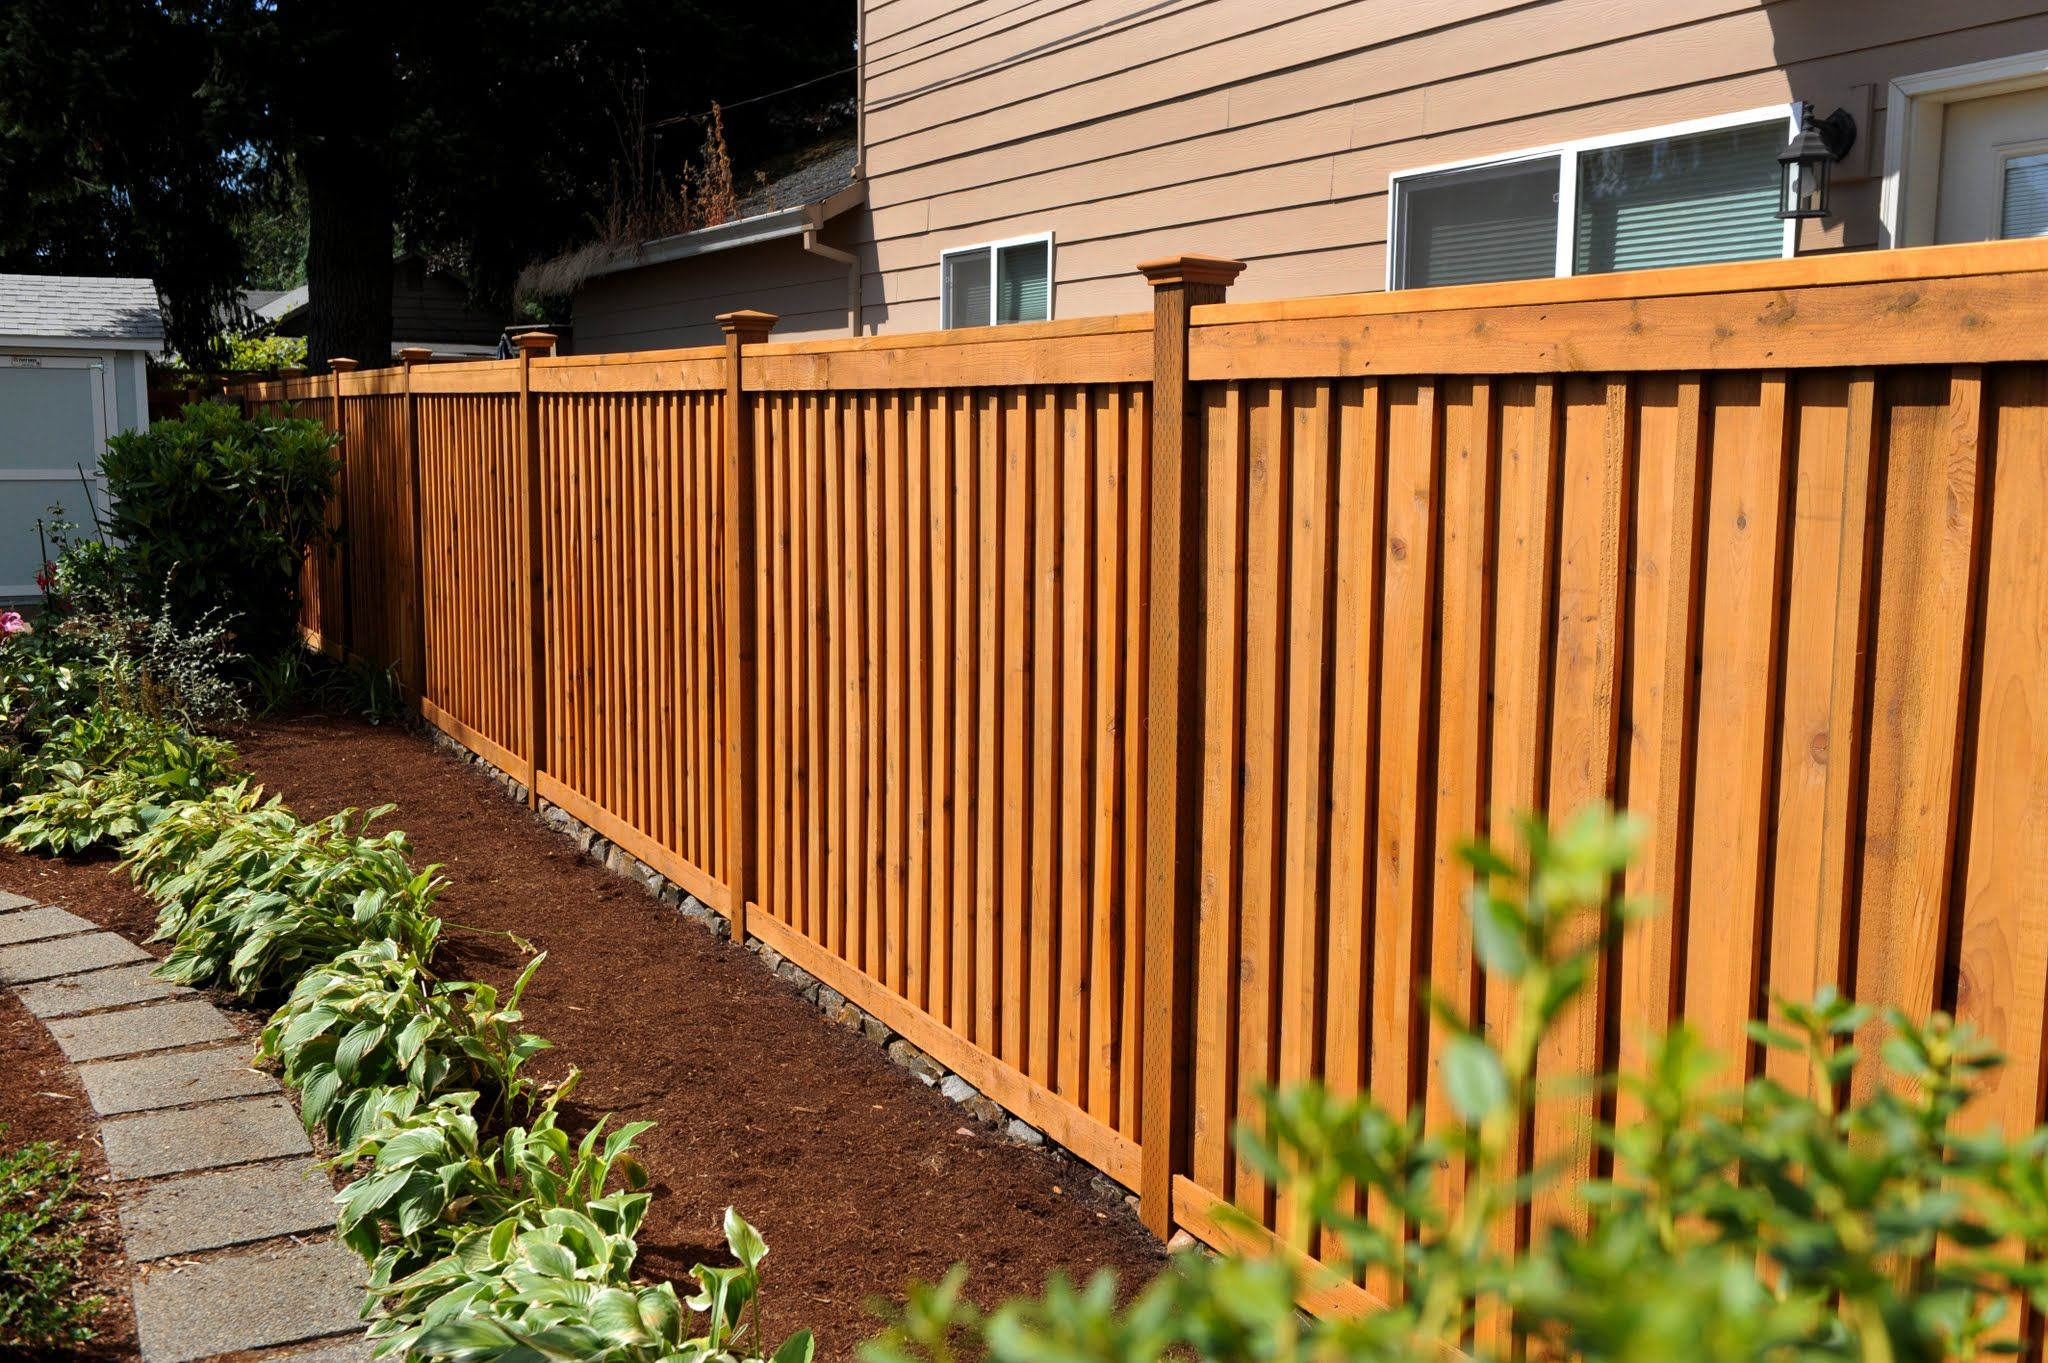 Cedar Wood Fences Oregon Washington Rick S Custom Fencing Decking Cedar Wood Fence Wood Fence Design Wooden Garden Gate